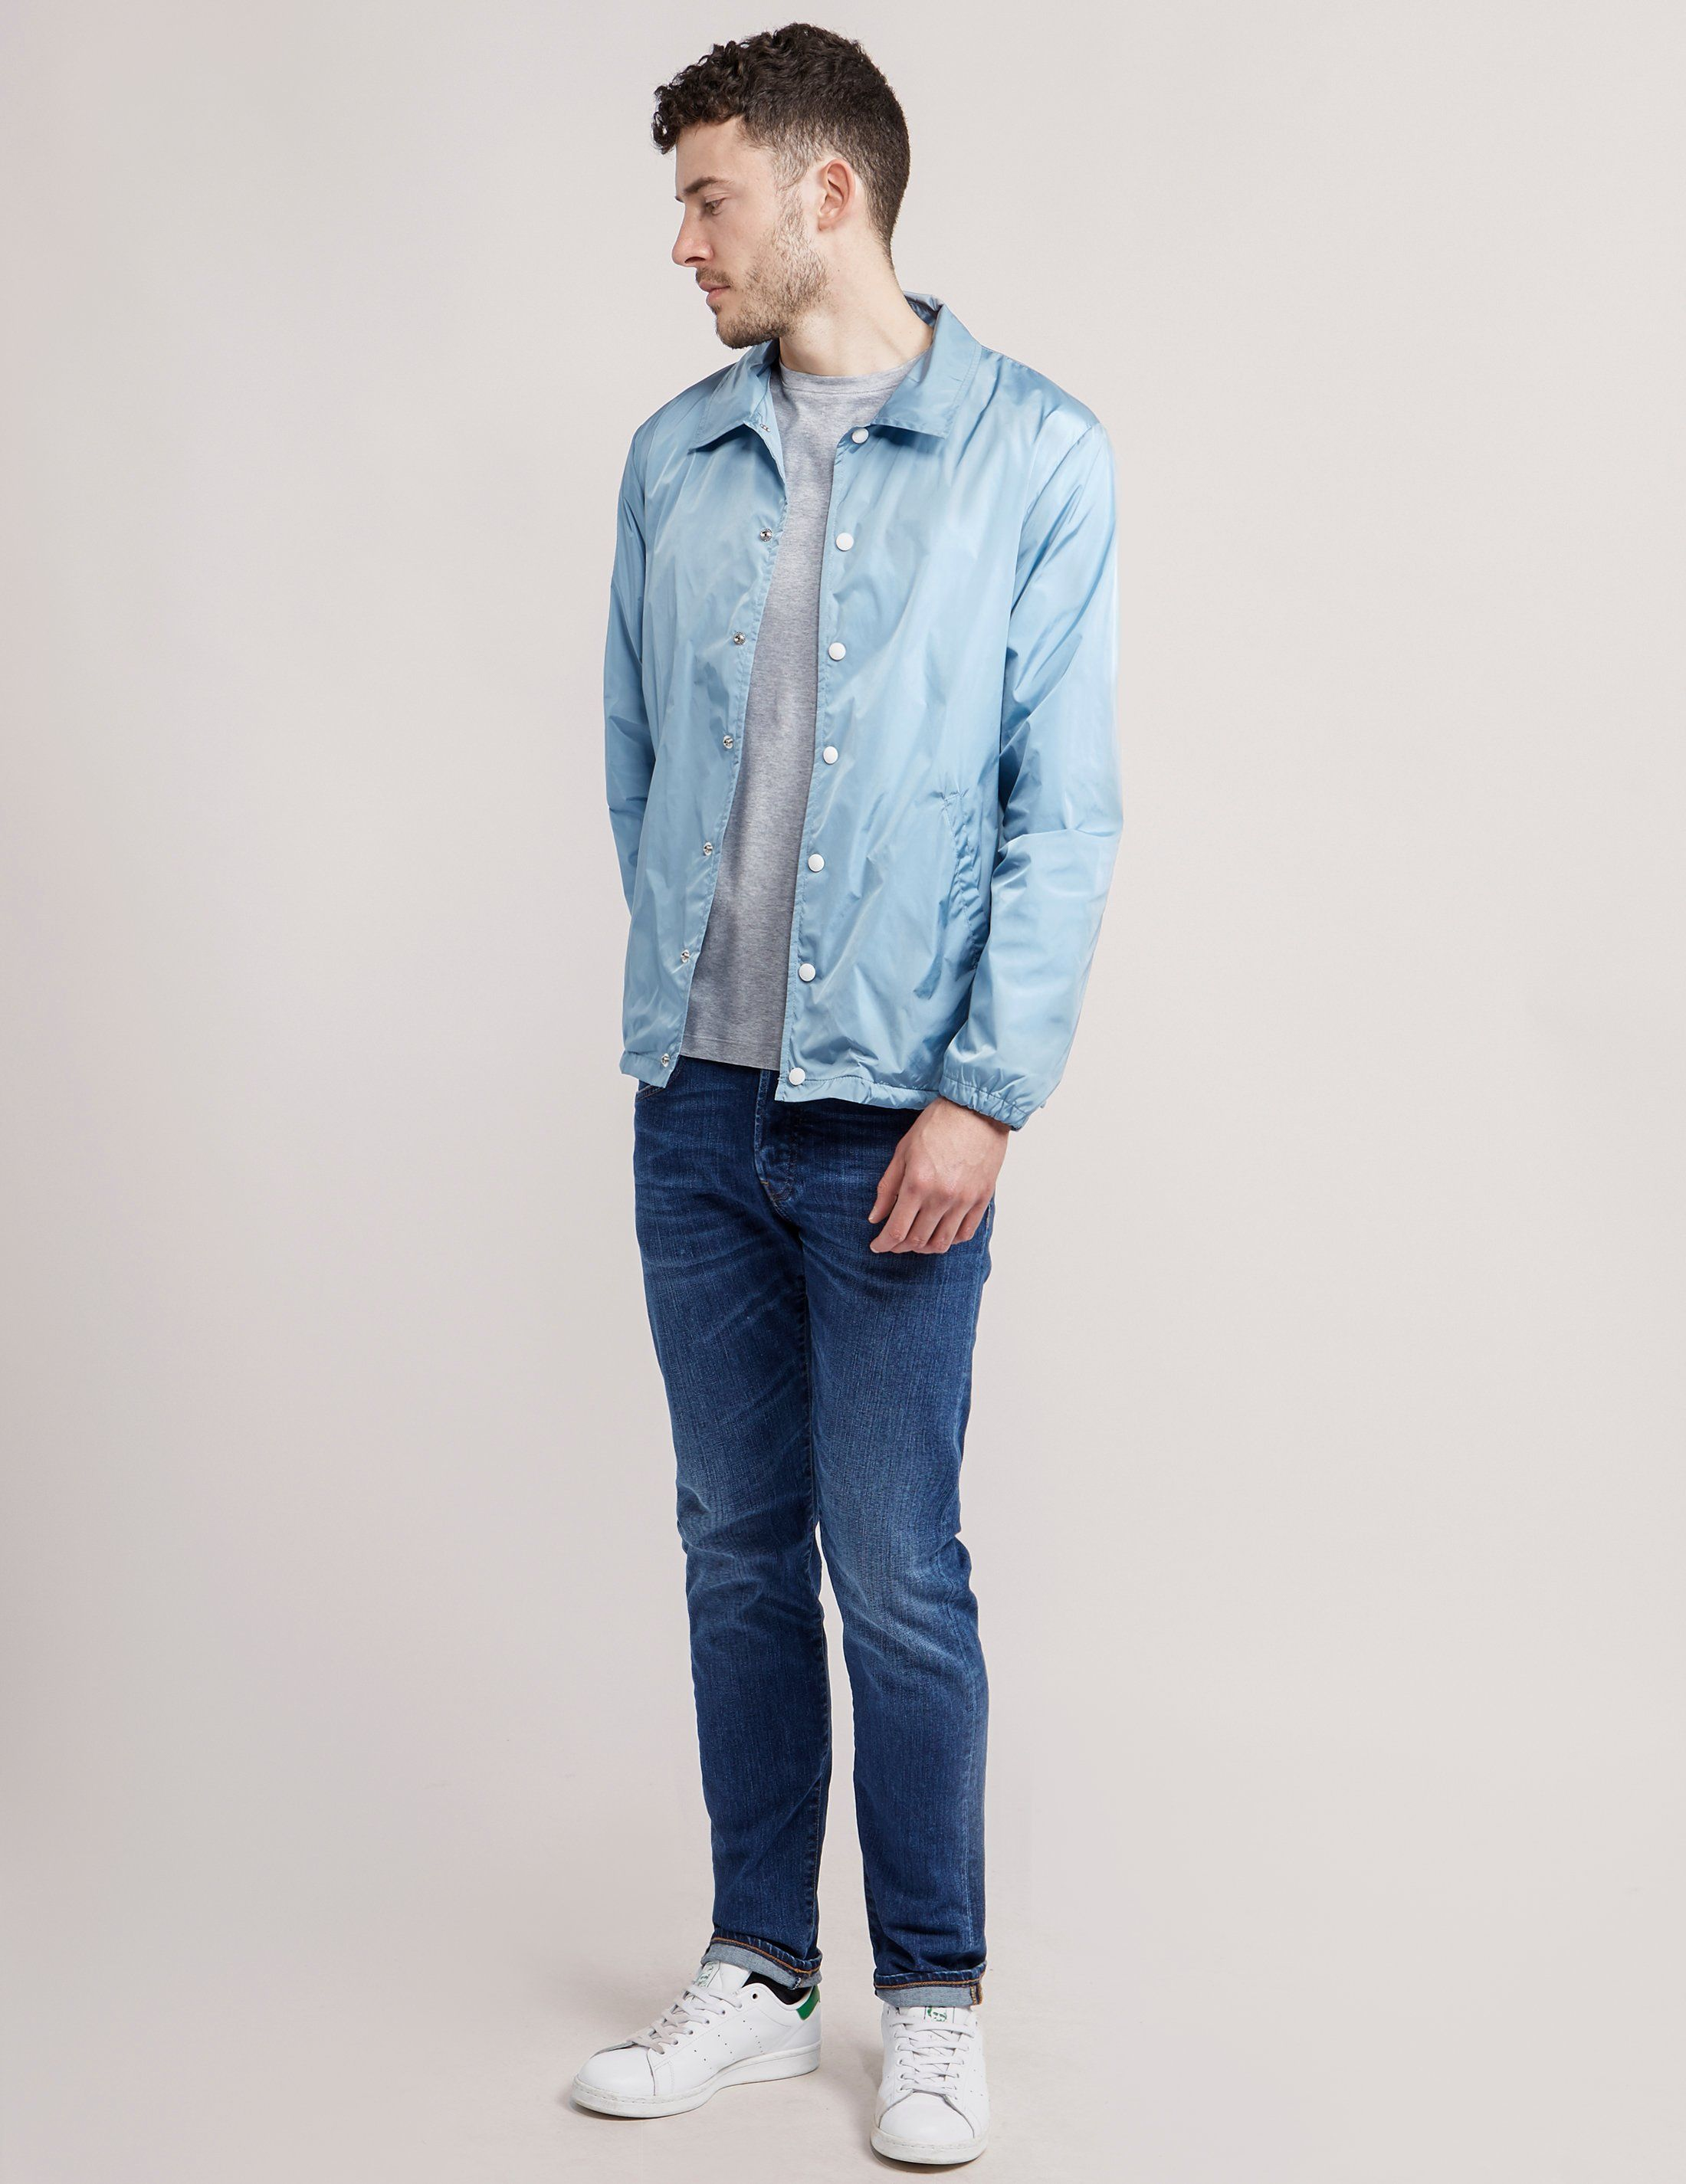 Maison Kitsune Light Windbreaker Jacket - Online Exclusive